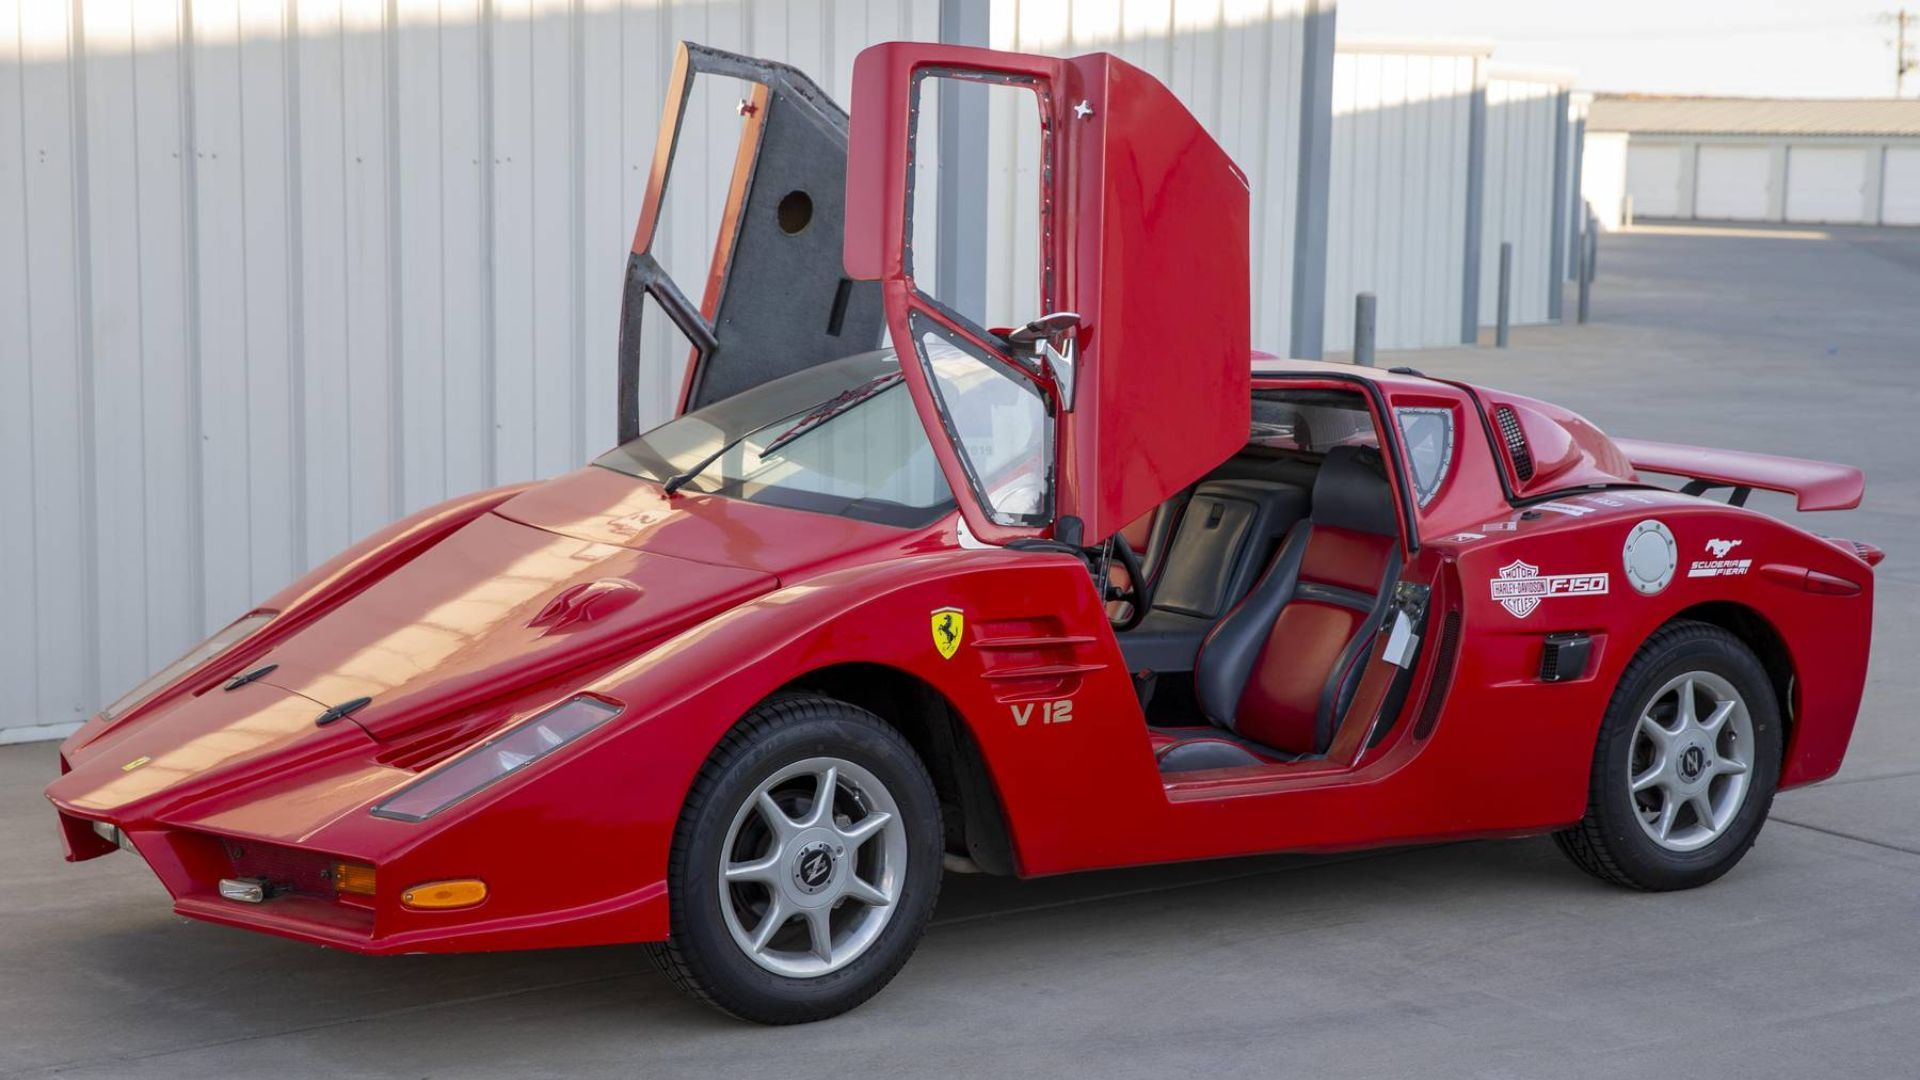 1986 Pontiac Fiero Gives You That Ferrari Enzo Look